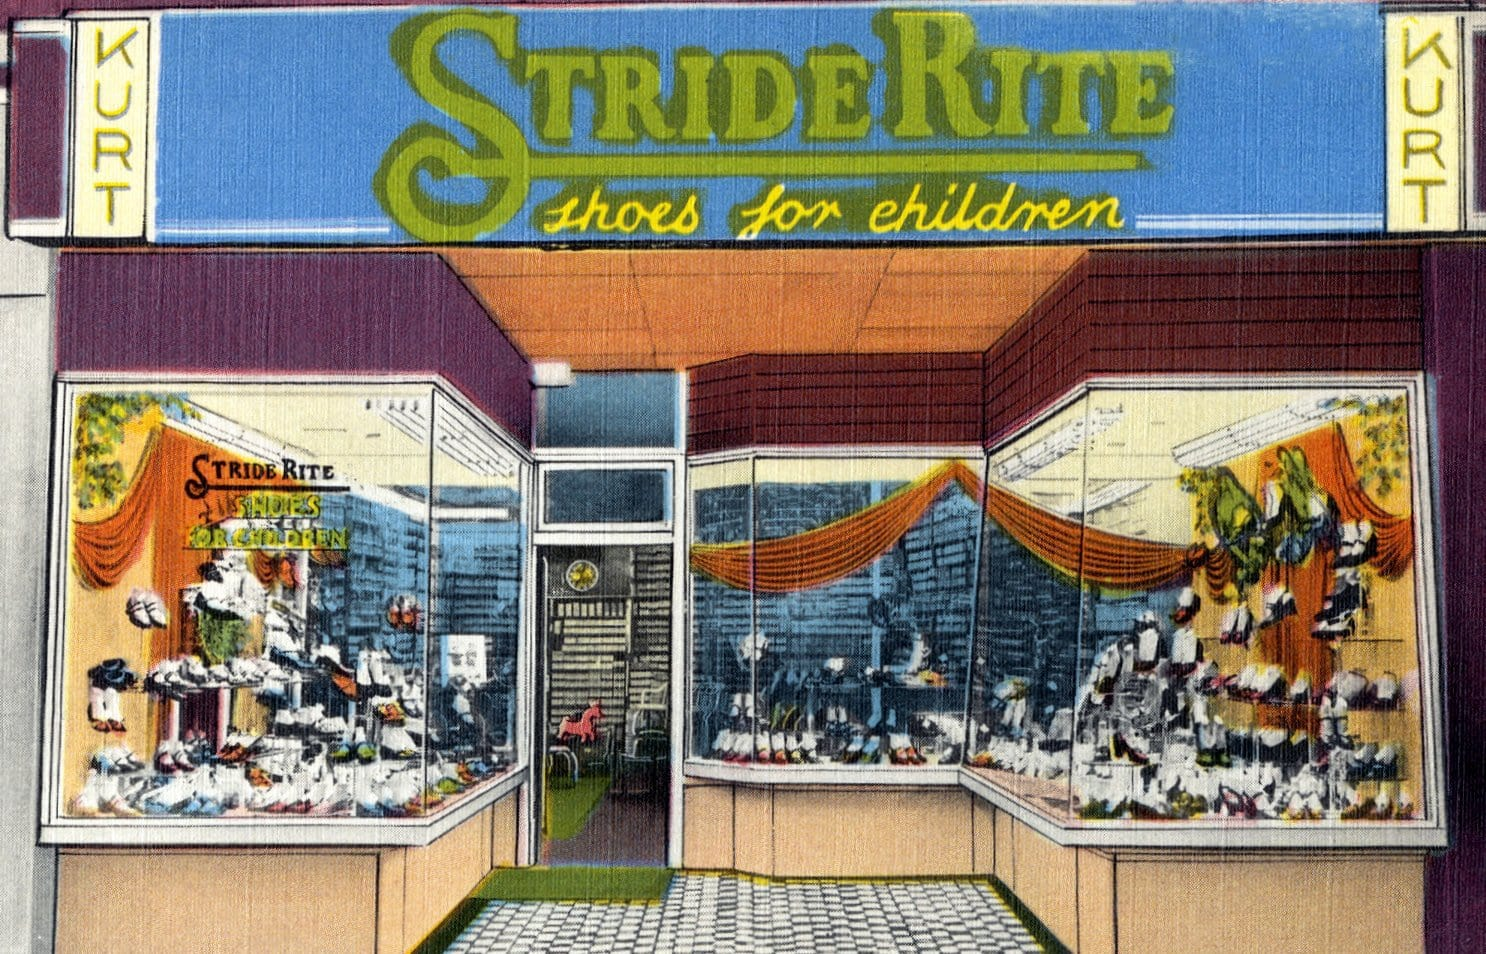 Kurt Stride Rite Shoes for Children - New York (1940s)